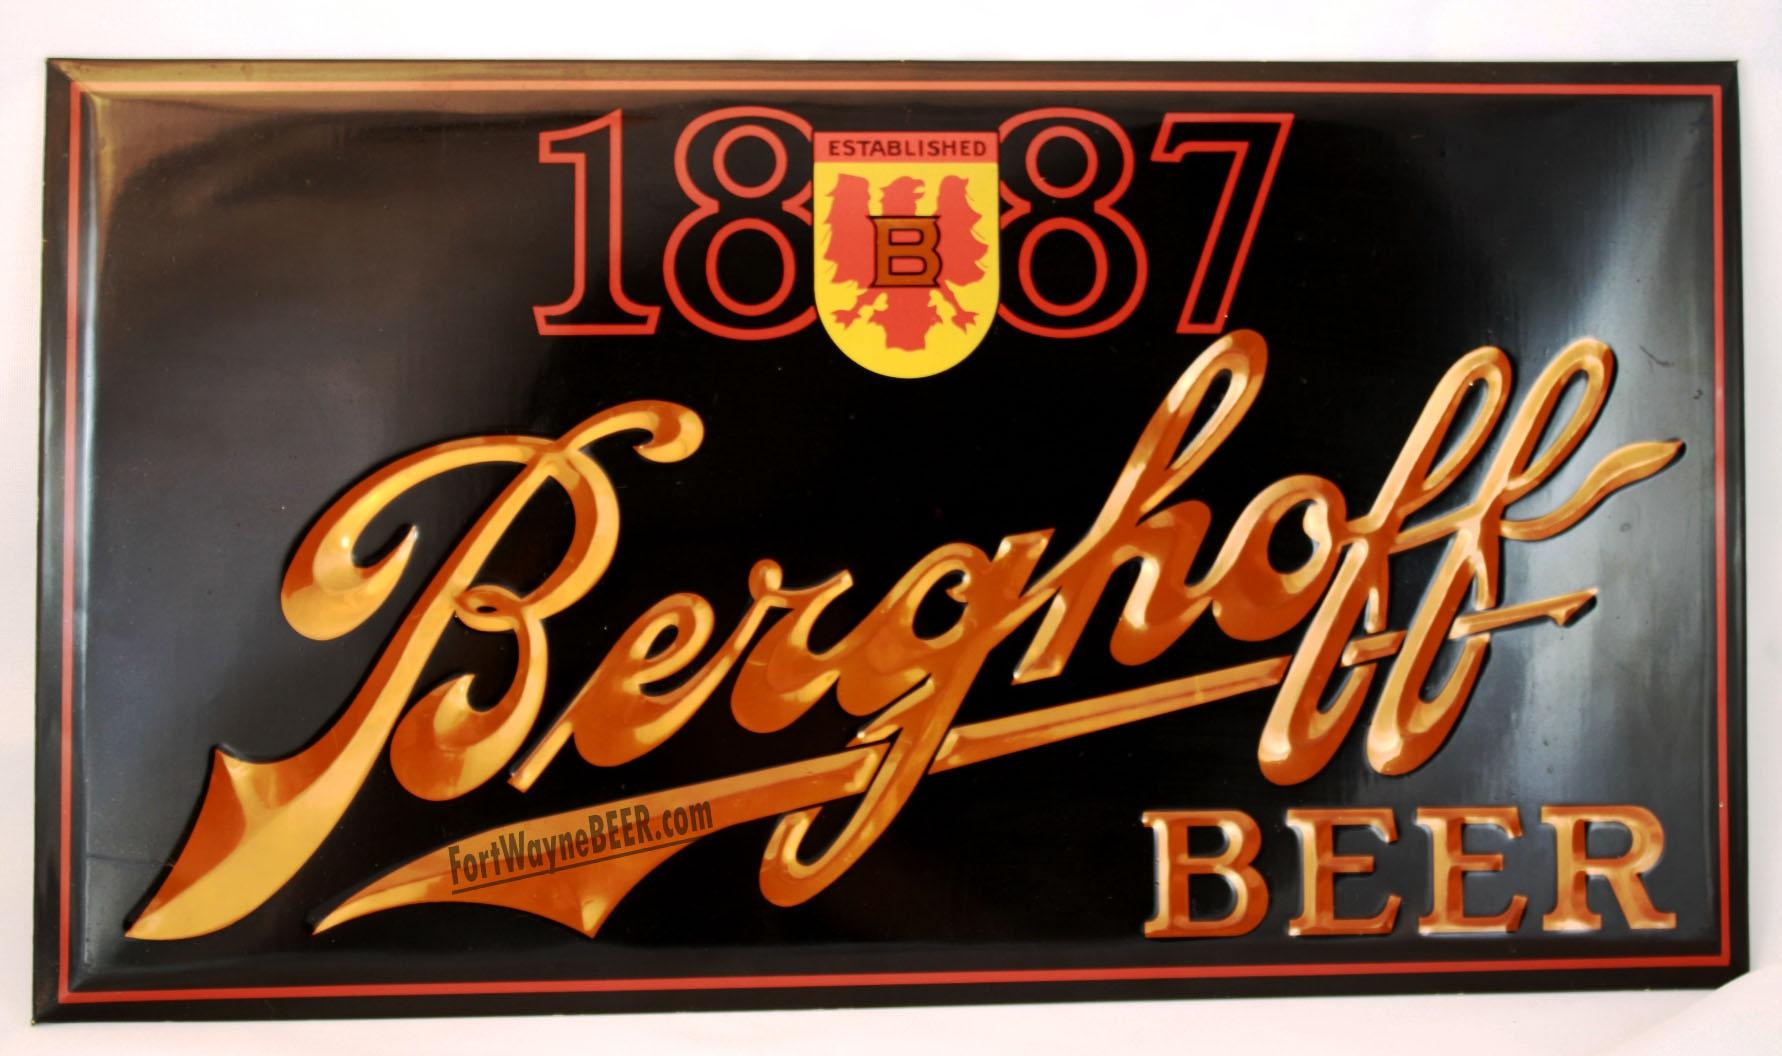 Berghoff sign 4 copy.jpg